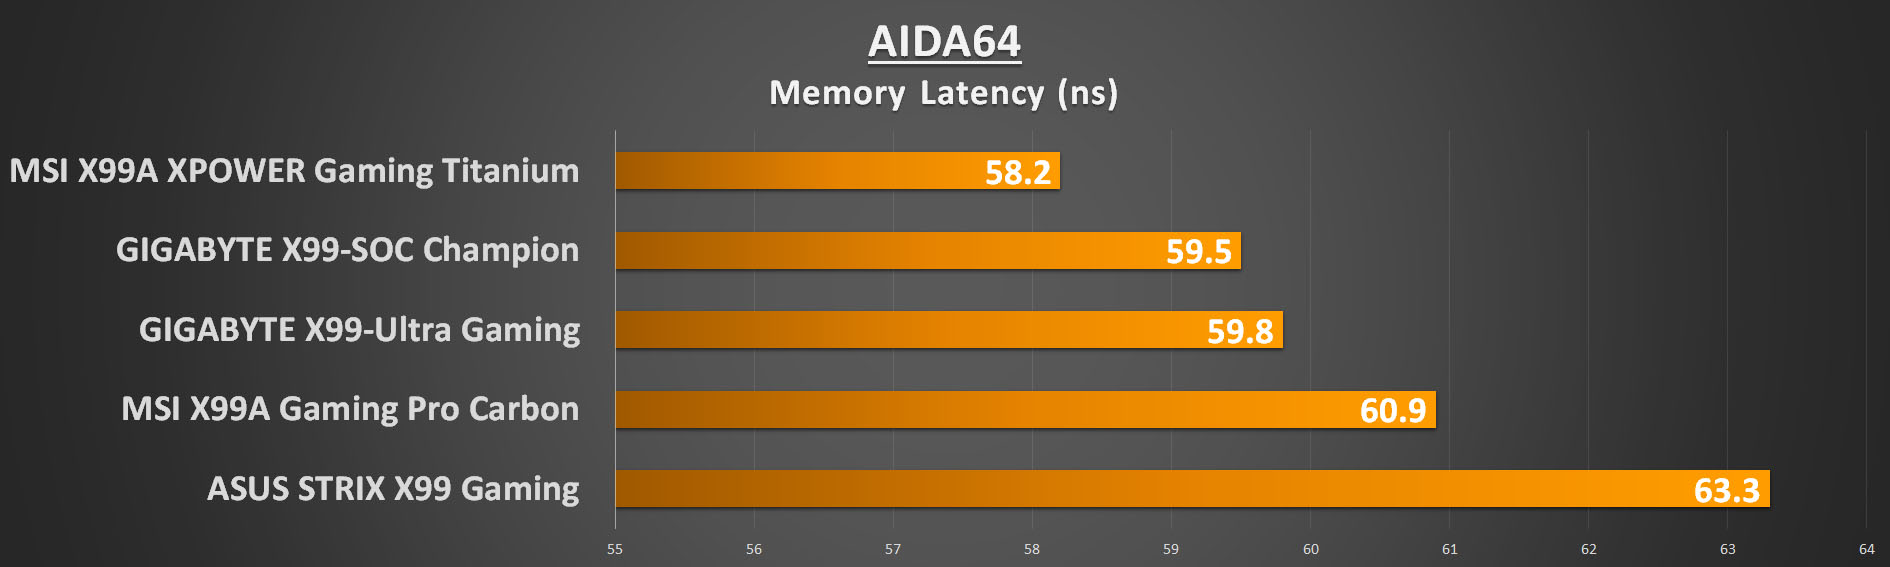 gigabyte-x99-ultra-gaming-aida-mem-lat